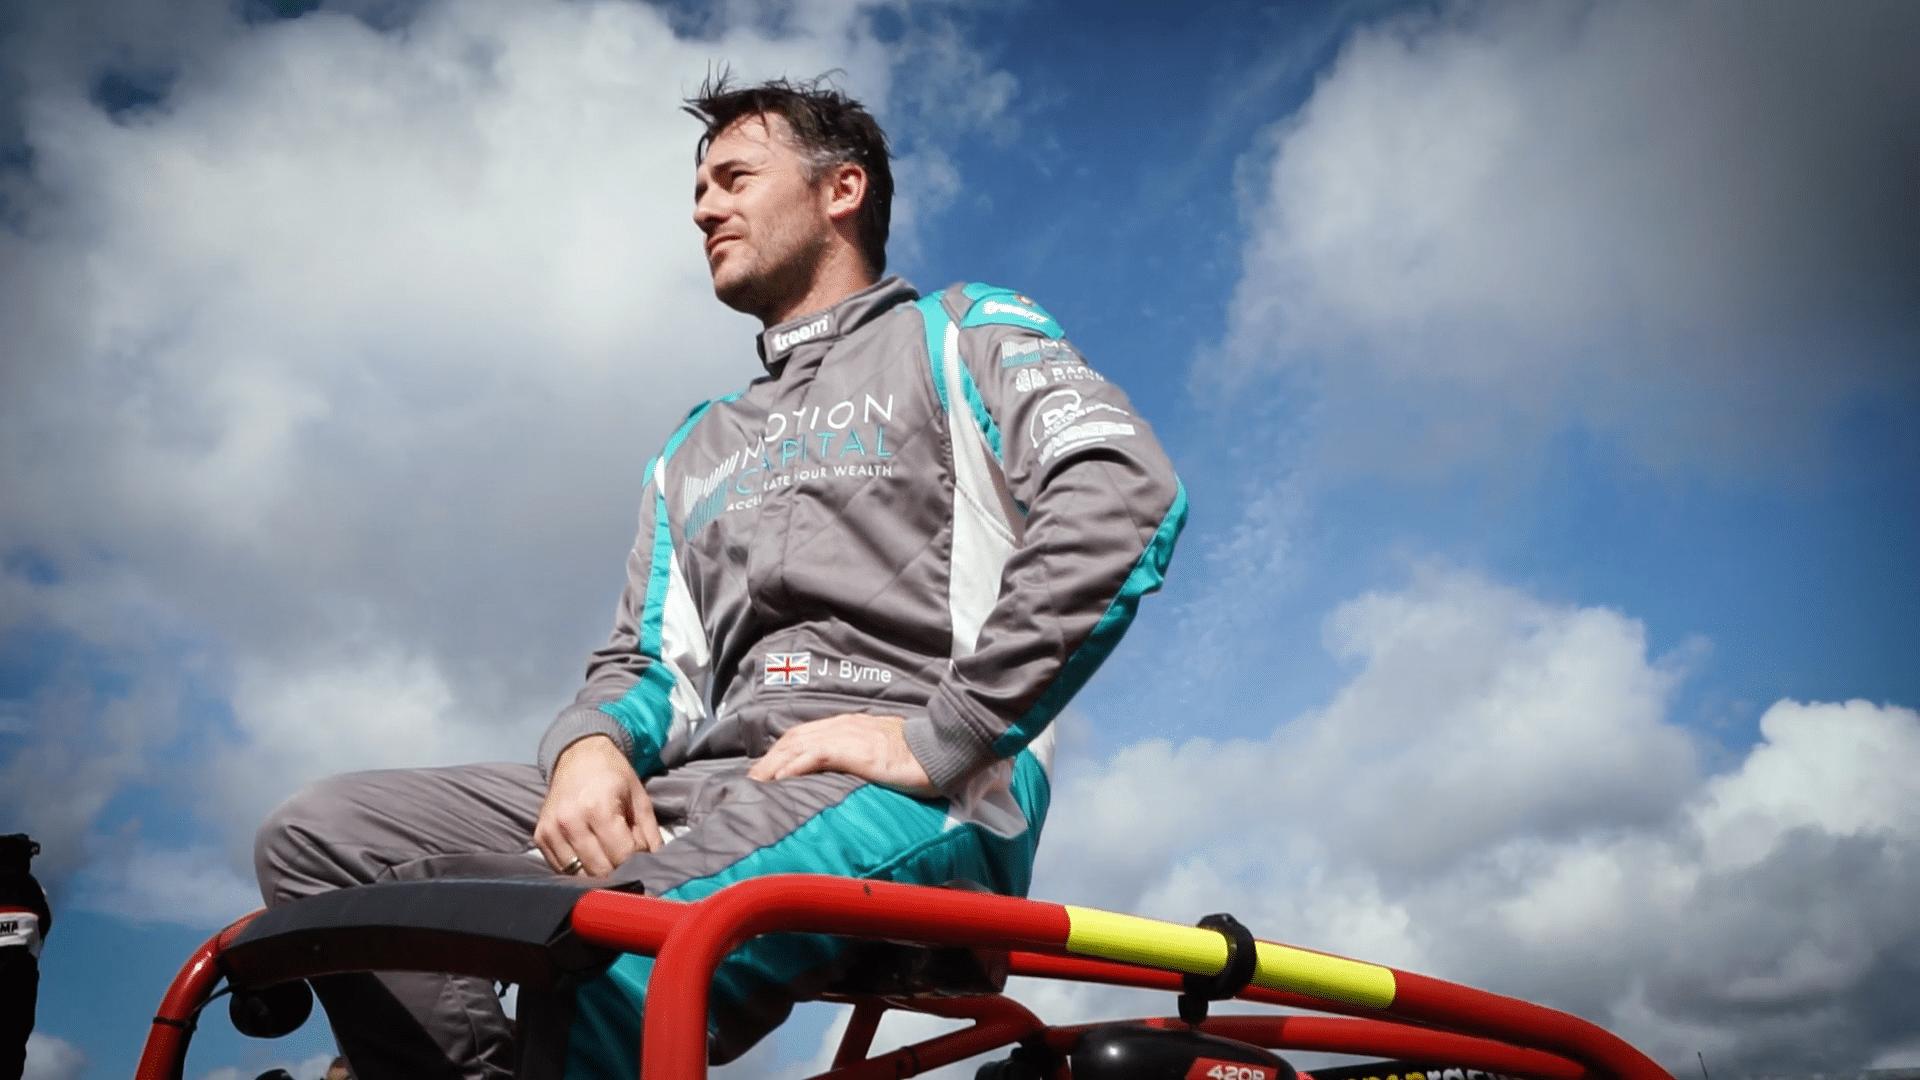 John Bryne racing driver portrait